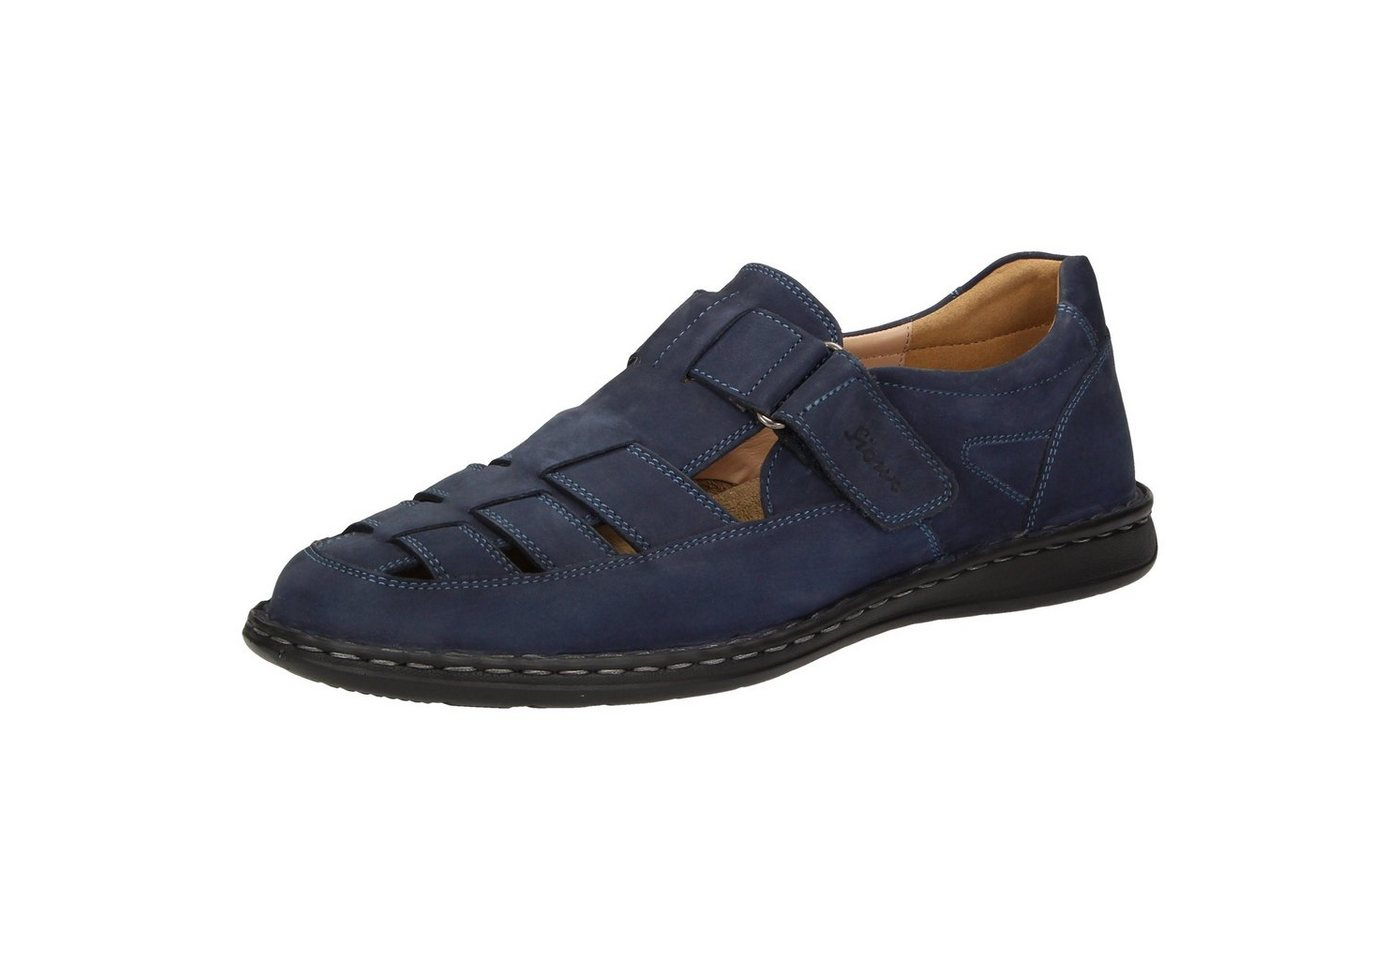 Herren SIOUX Elcino Sandale blau   04054765373790